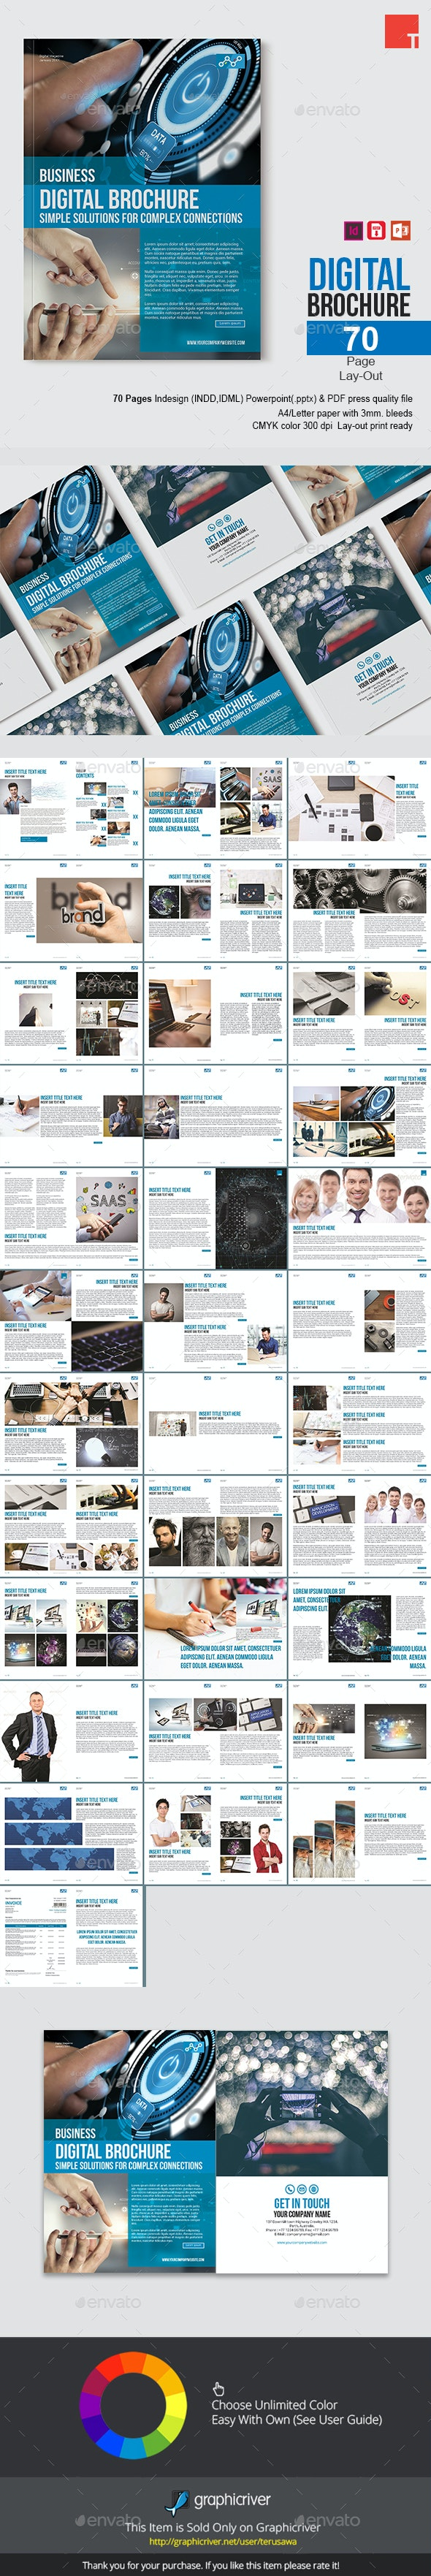 Digital Brochure Template - Print Templates